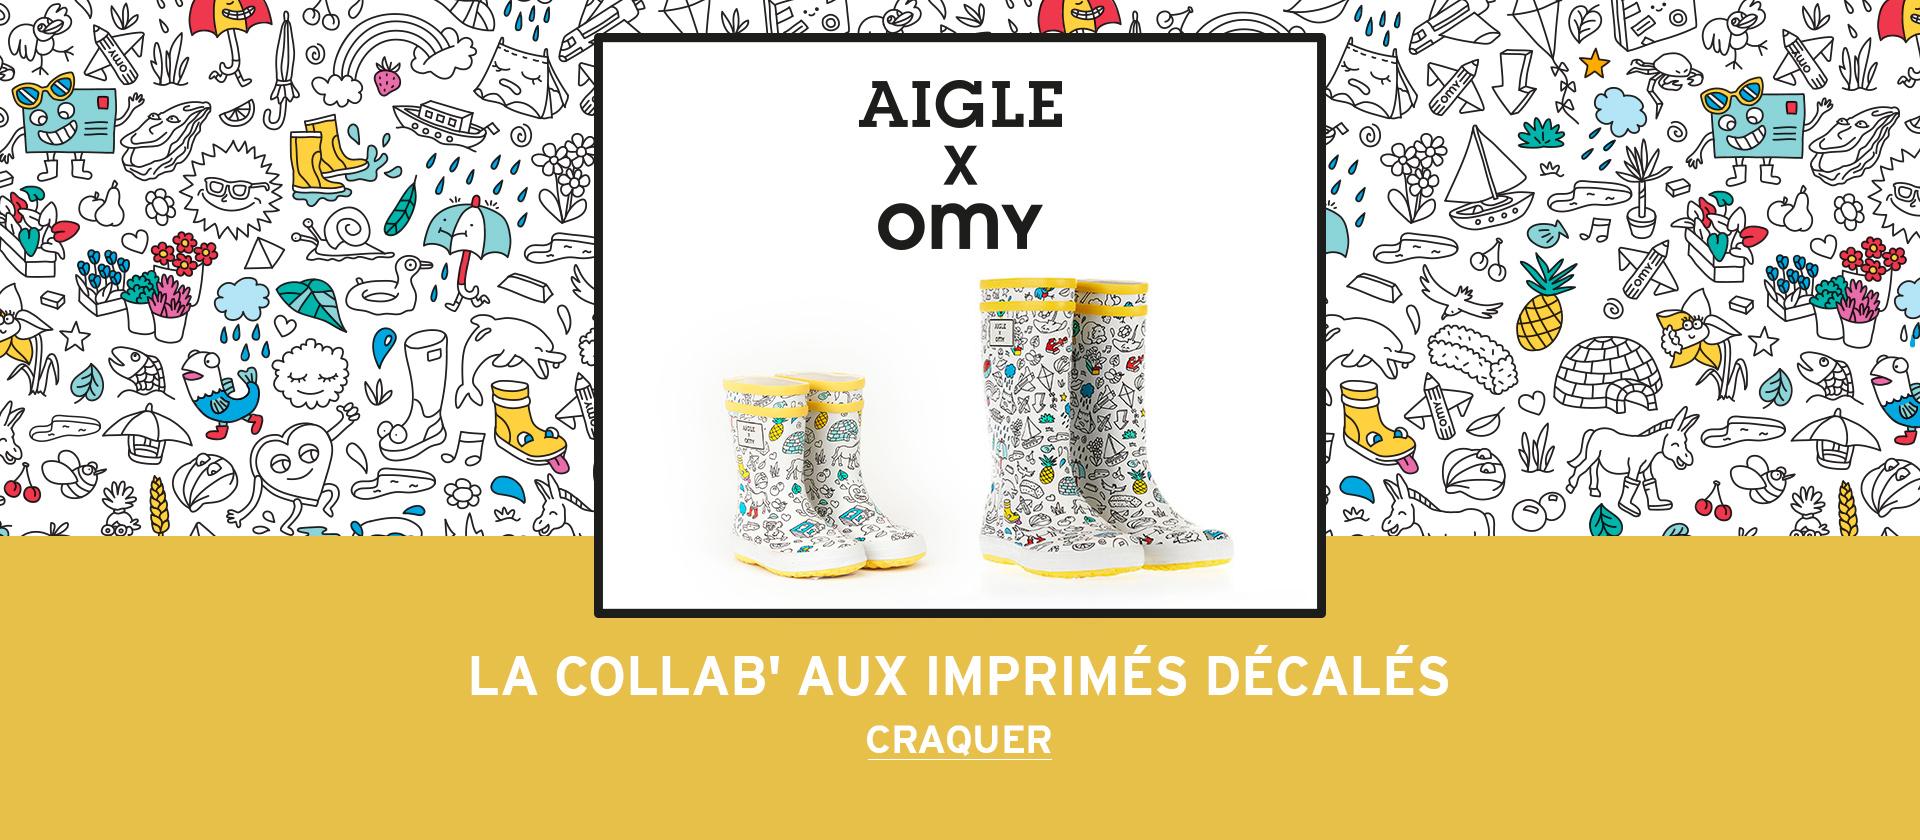 Collaboration Aigle x OMY